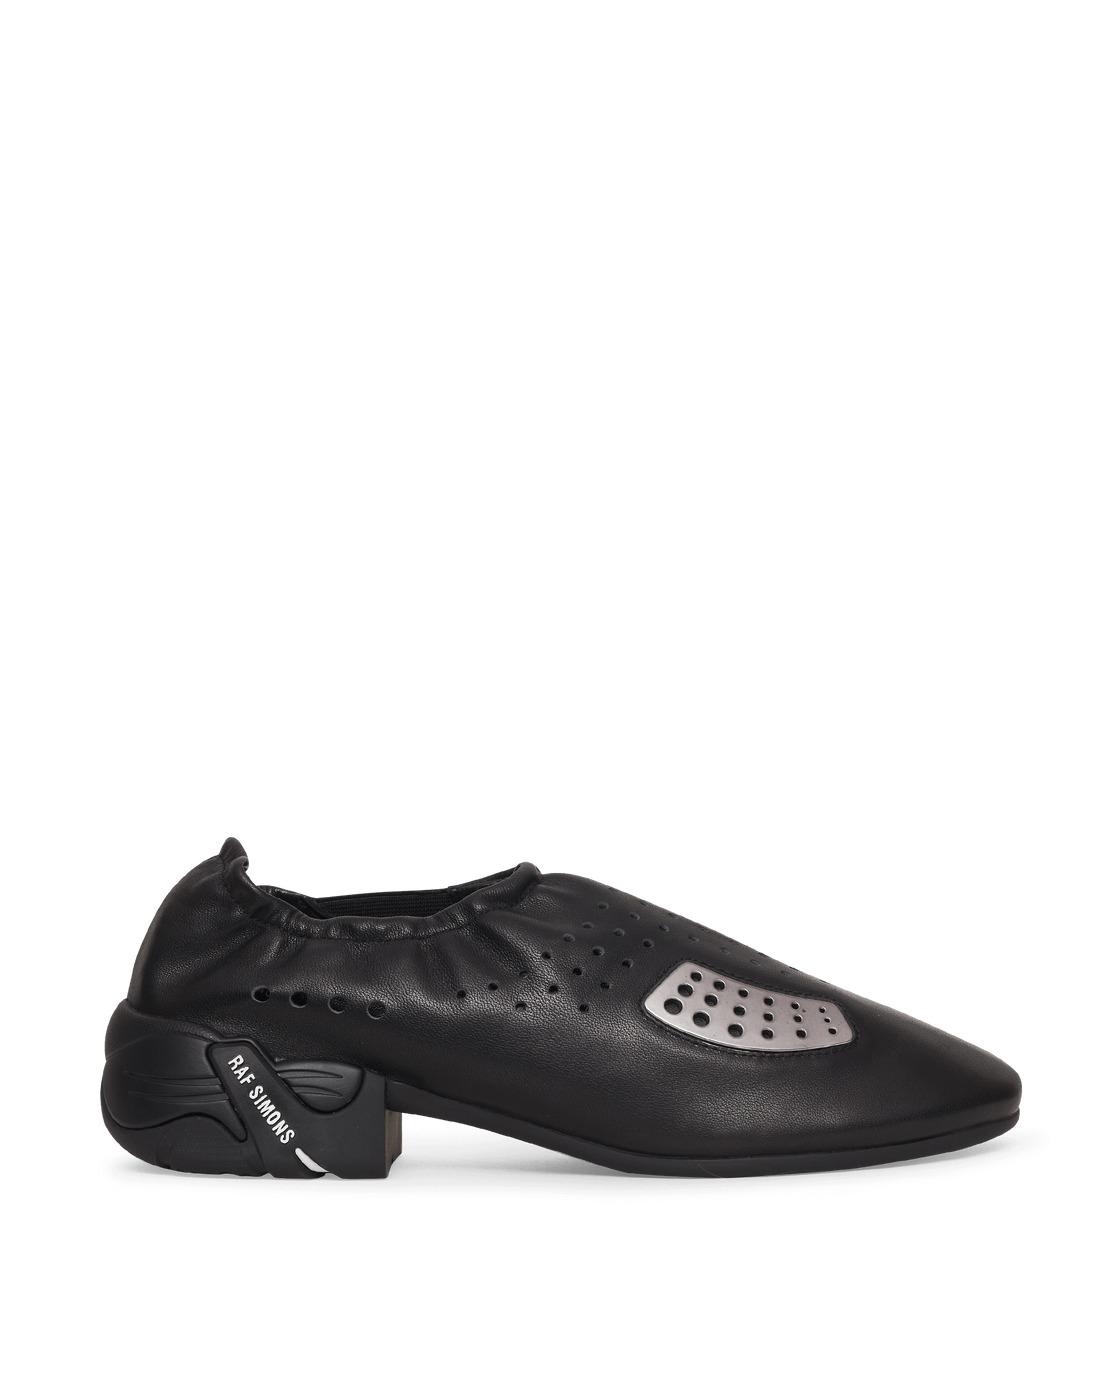 Raf Simons Runner Solaris 21 Low Boots Black